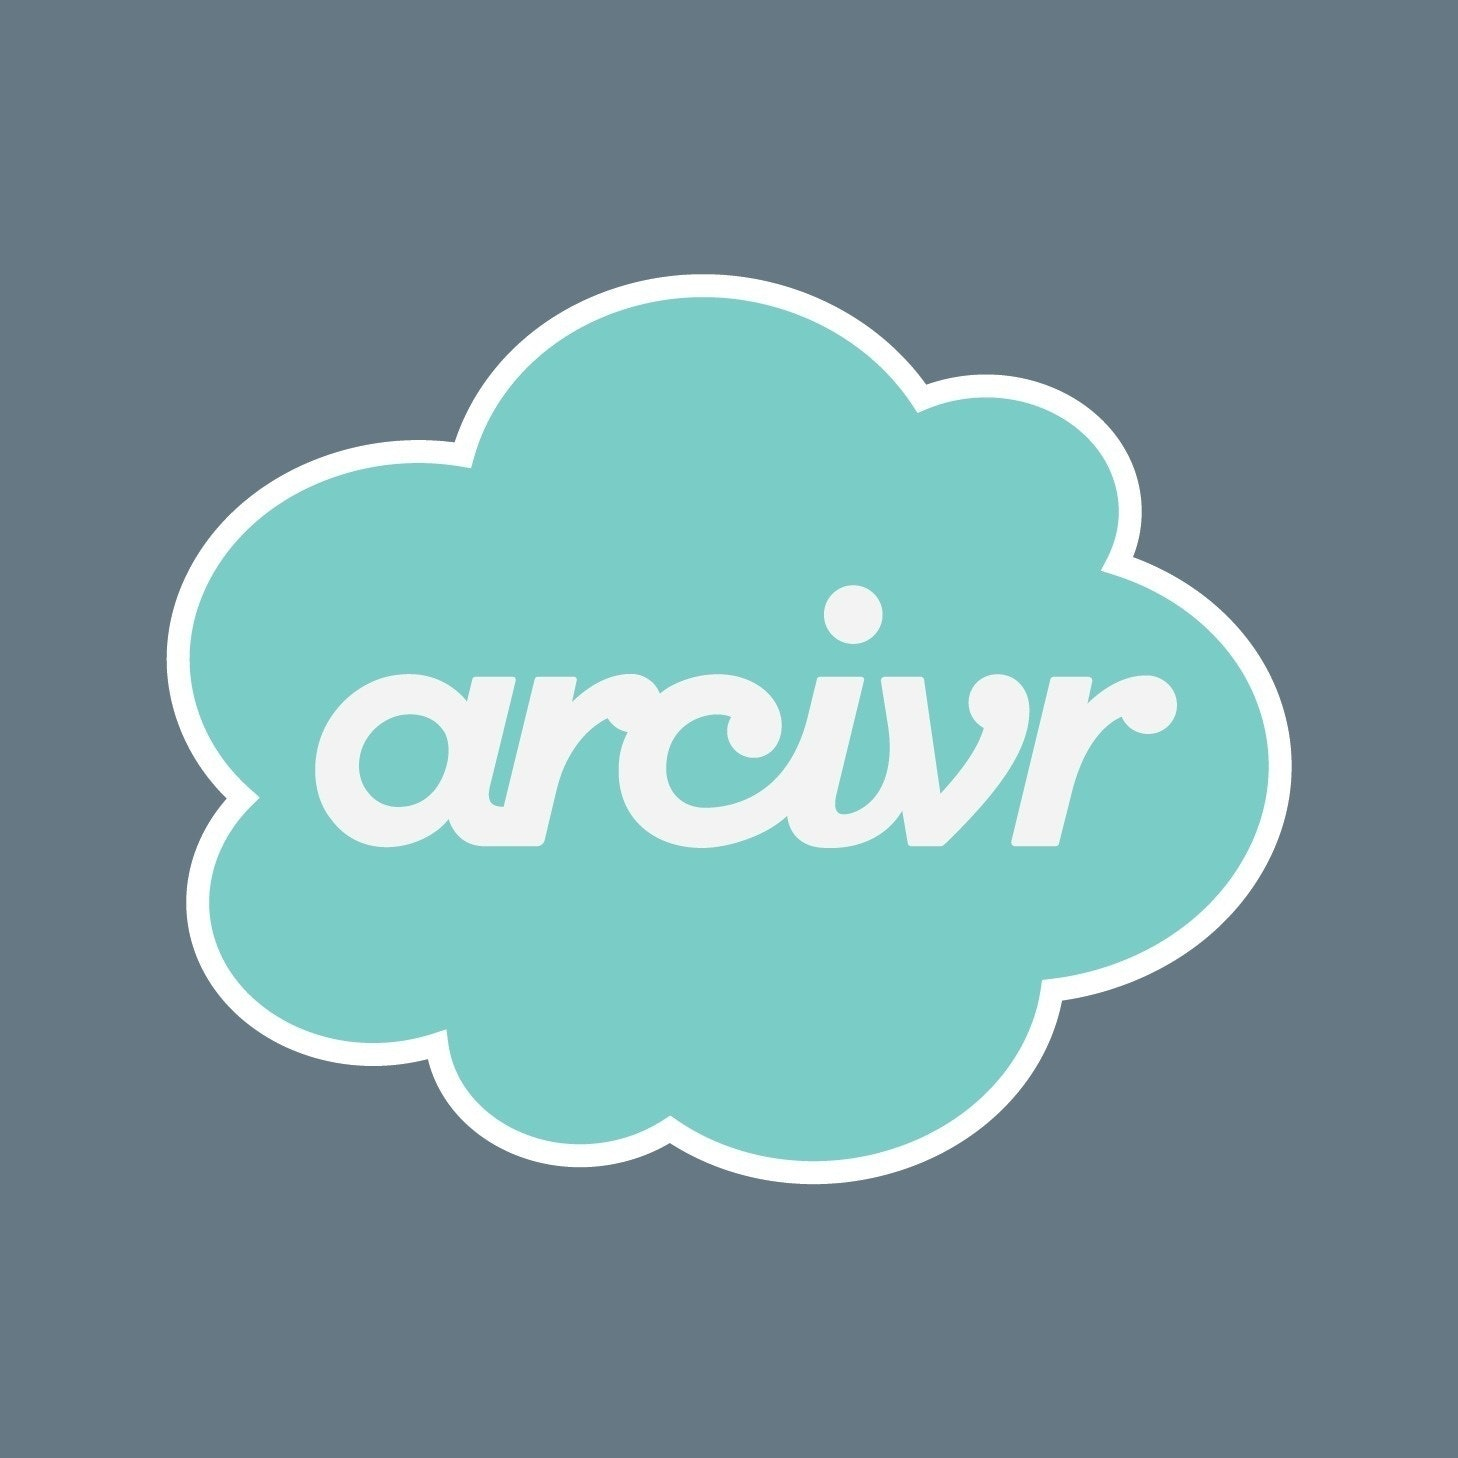 Arcivr